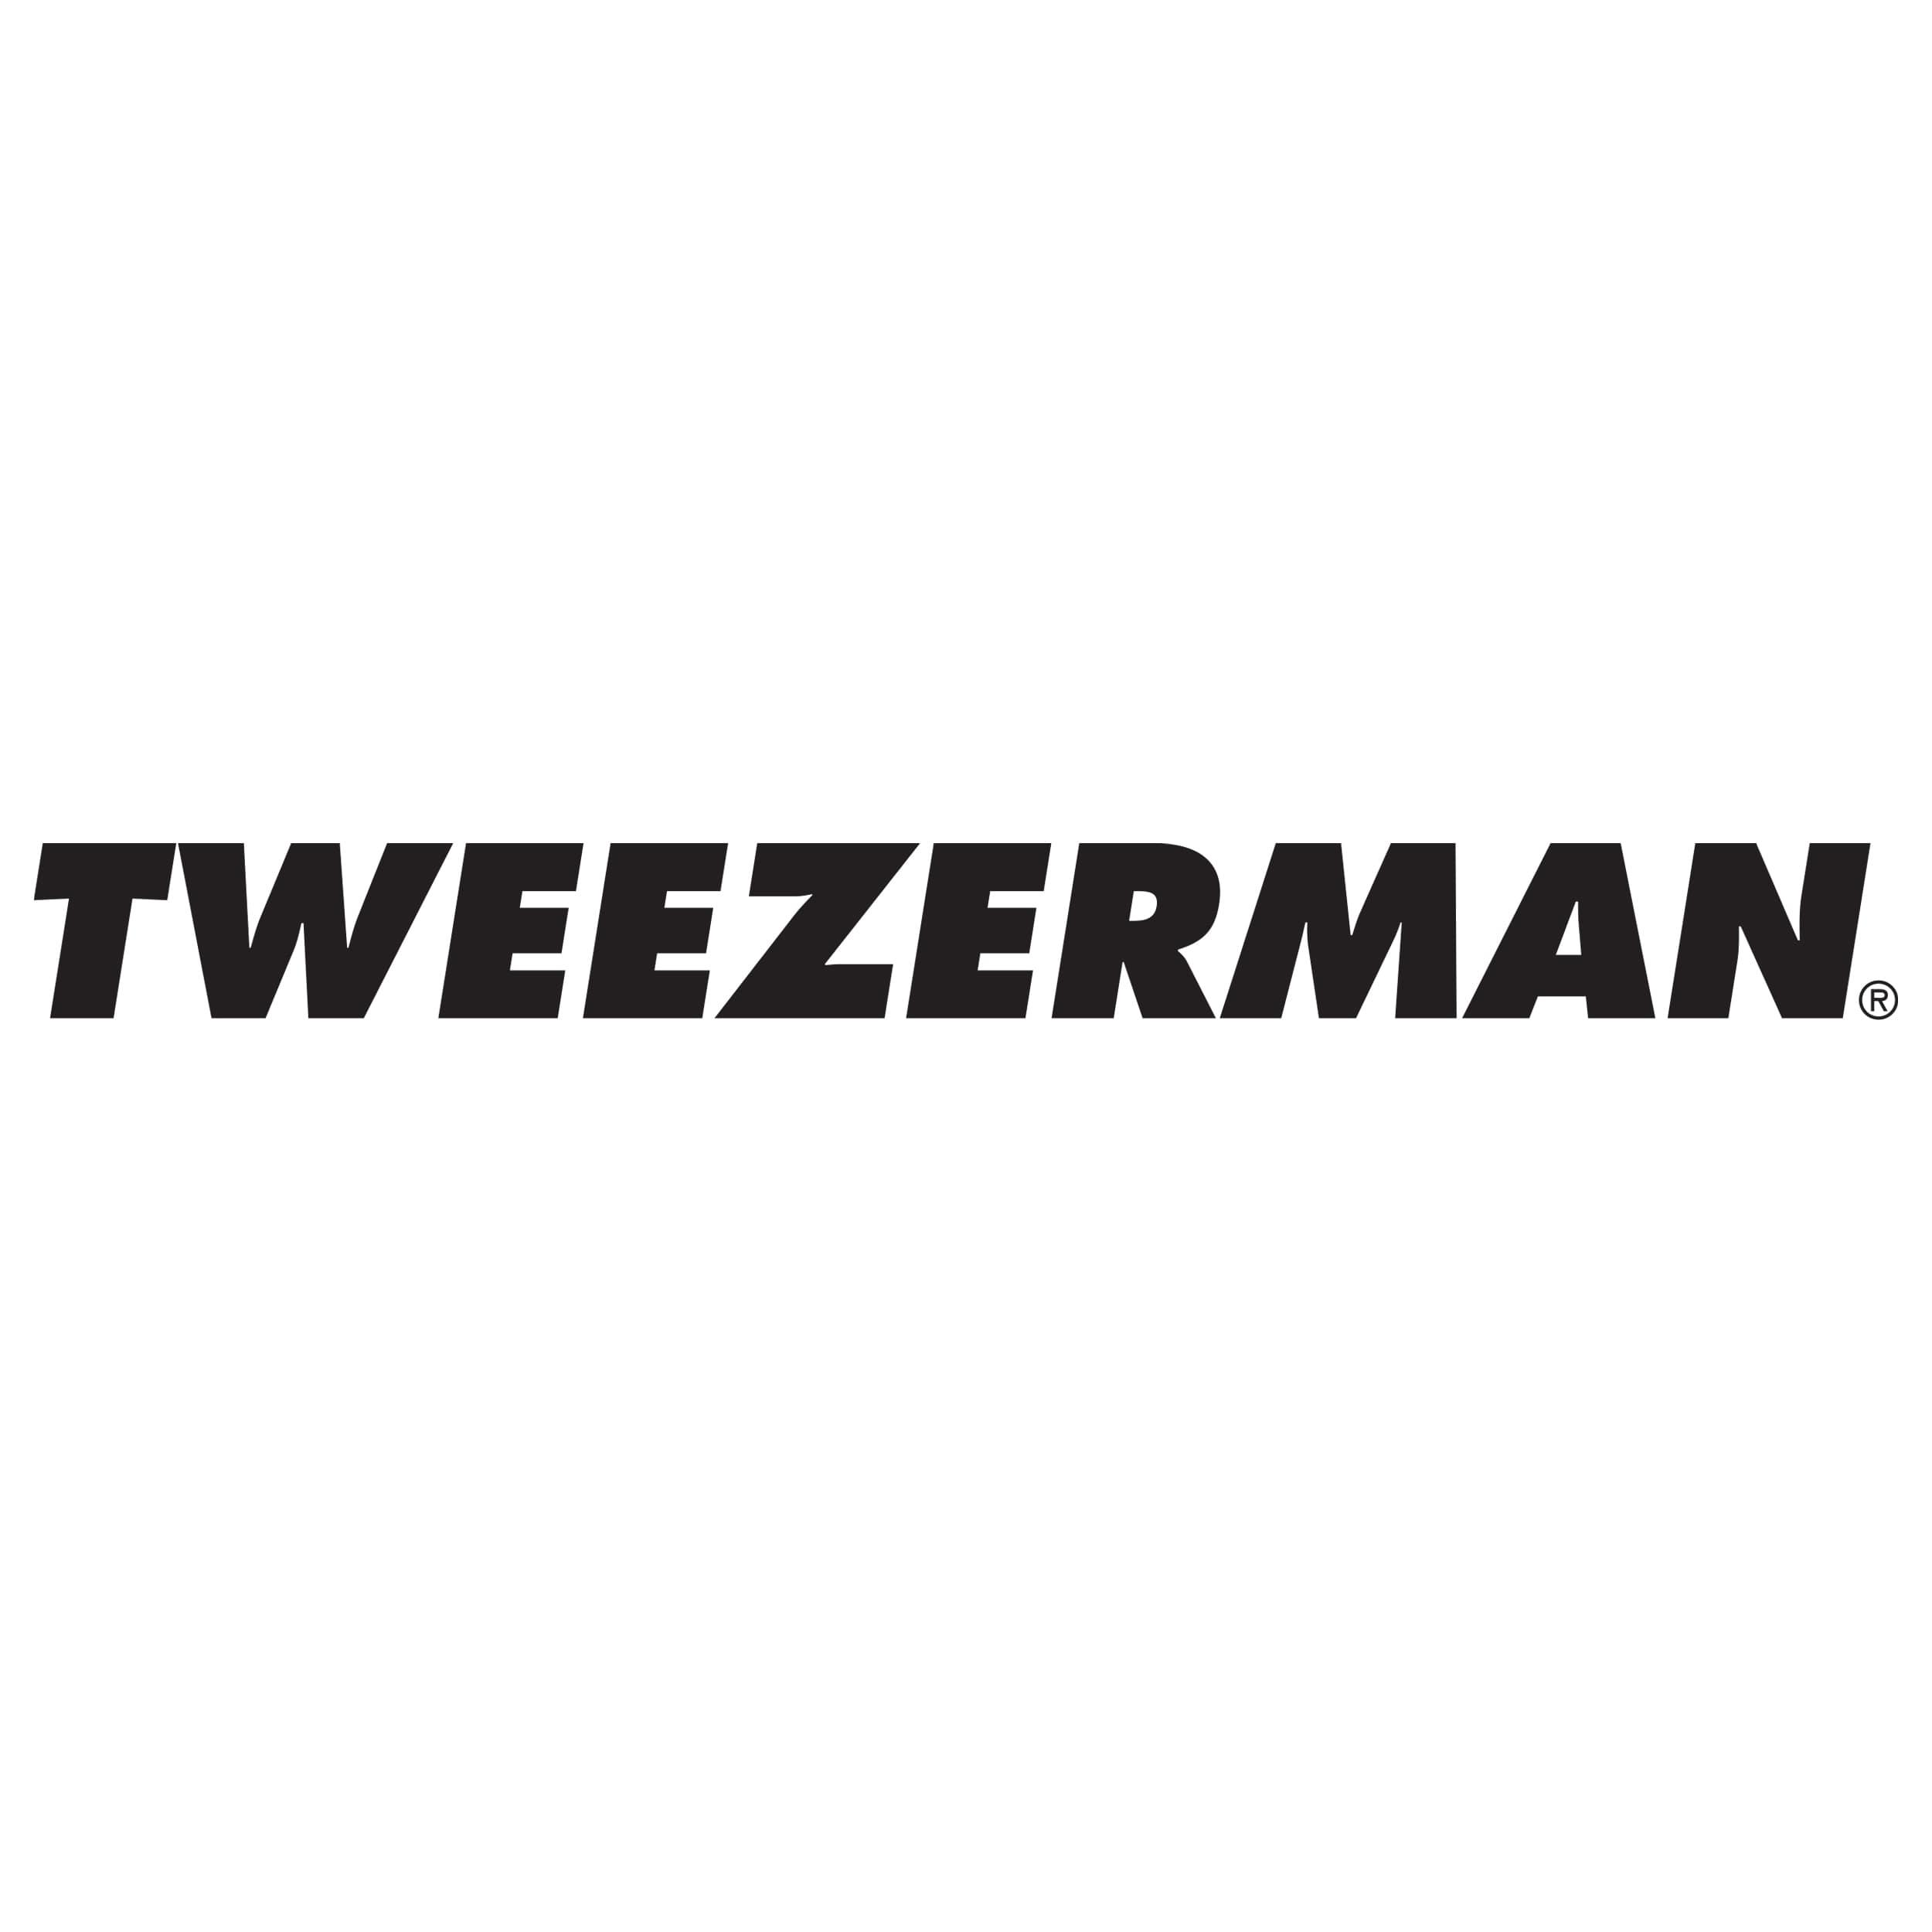 Point Tweezer